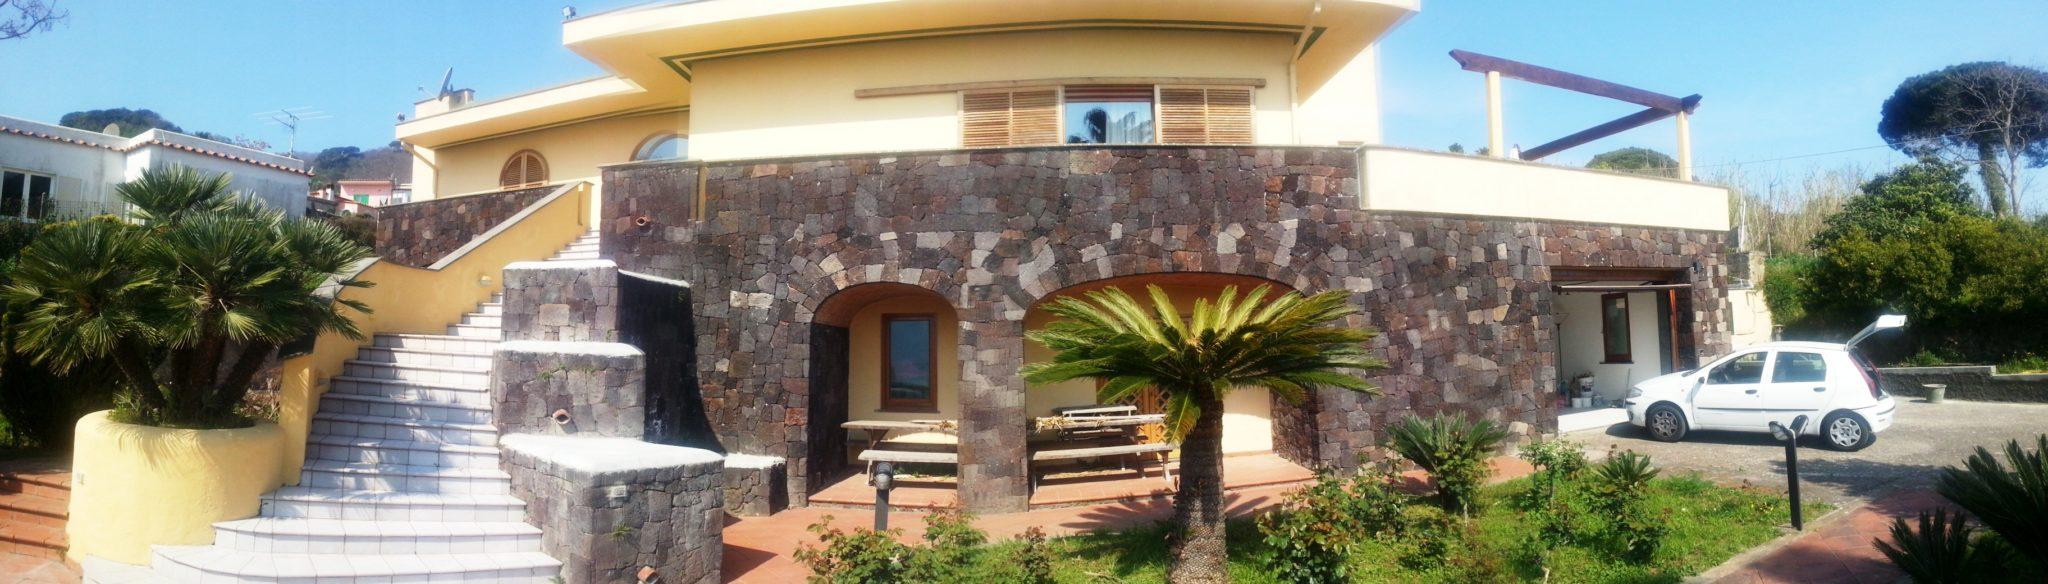 01 Villa Contessa giardino d'ingresso